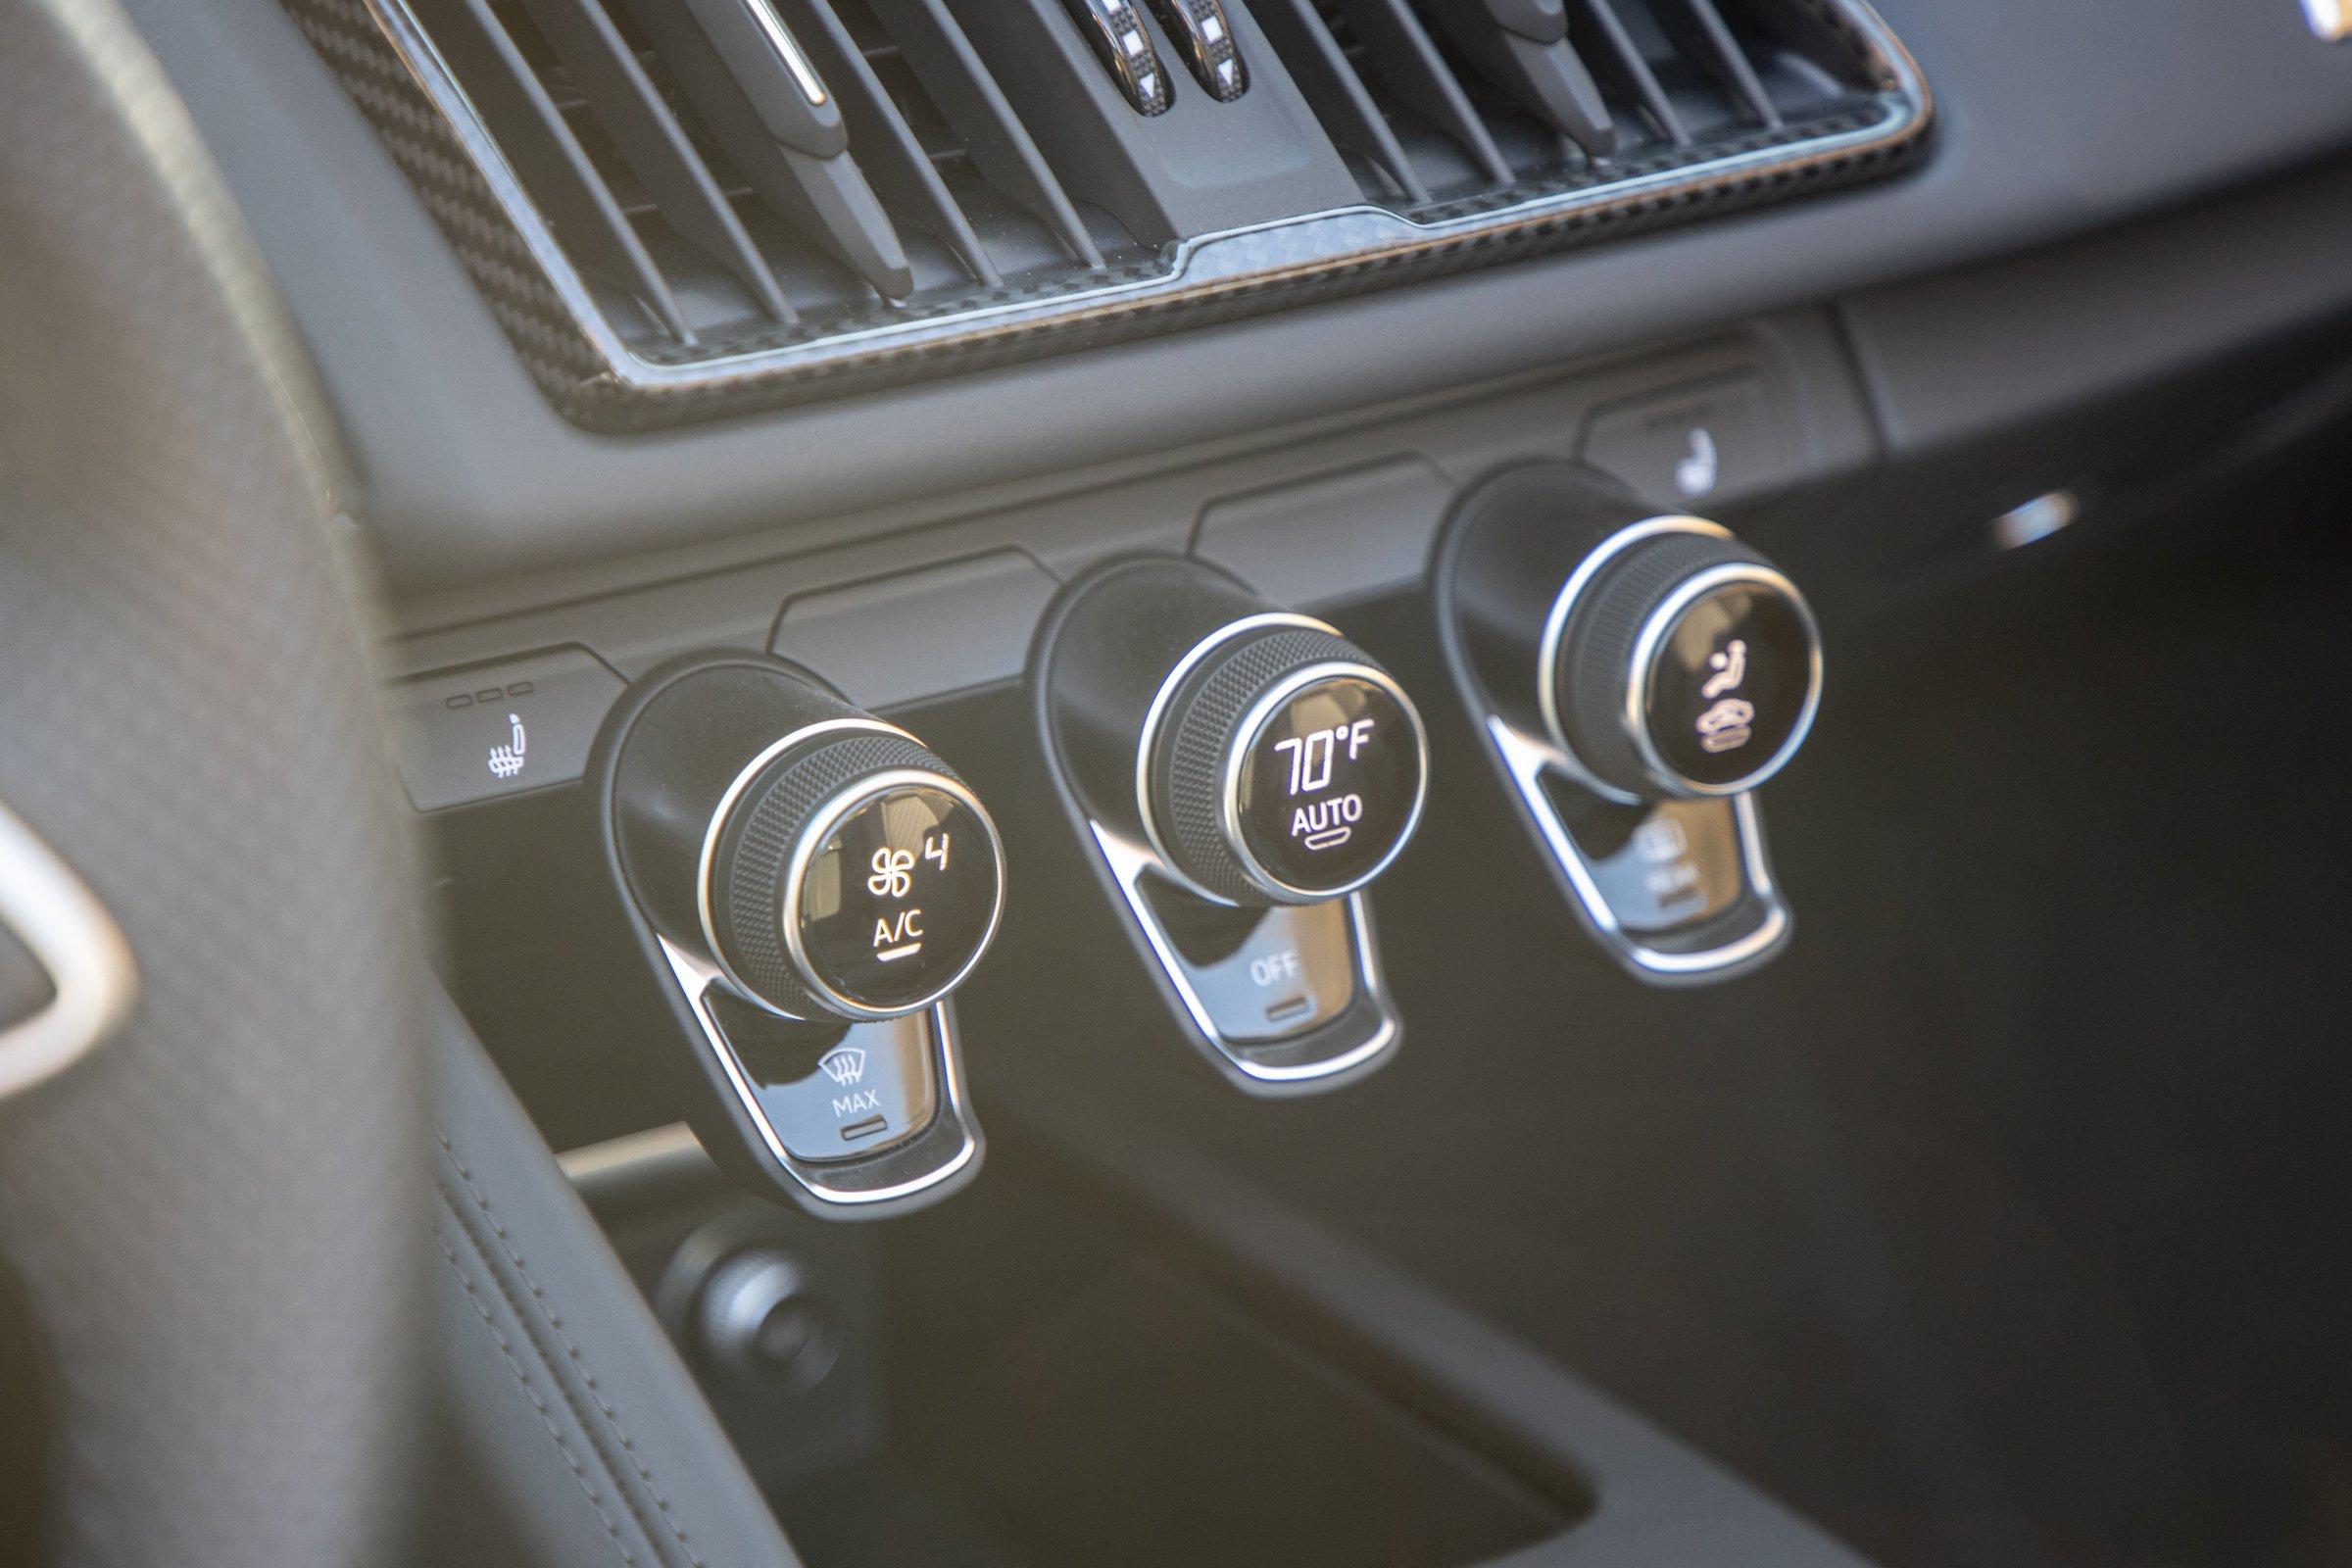 2020 Audi R8 Climate Control